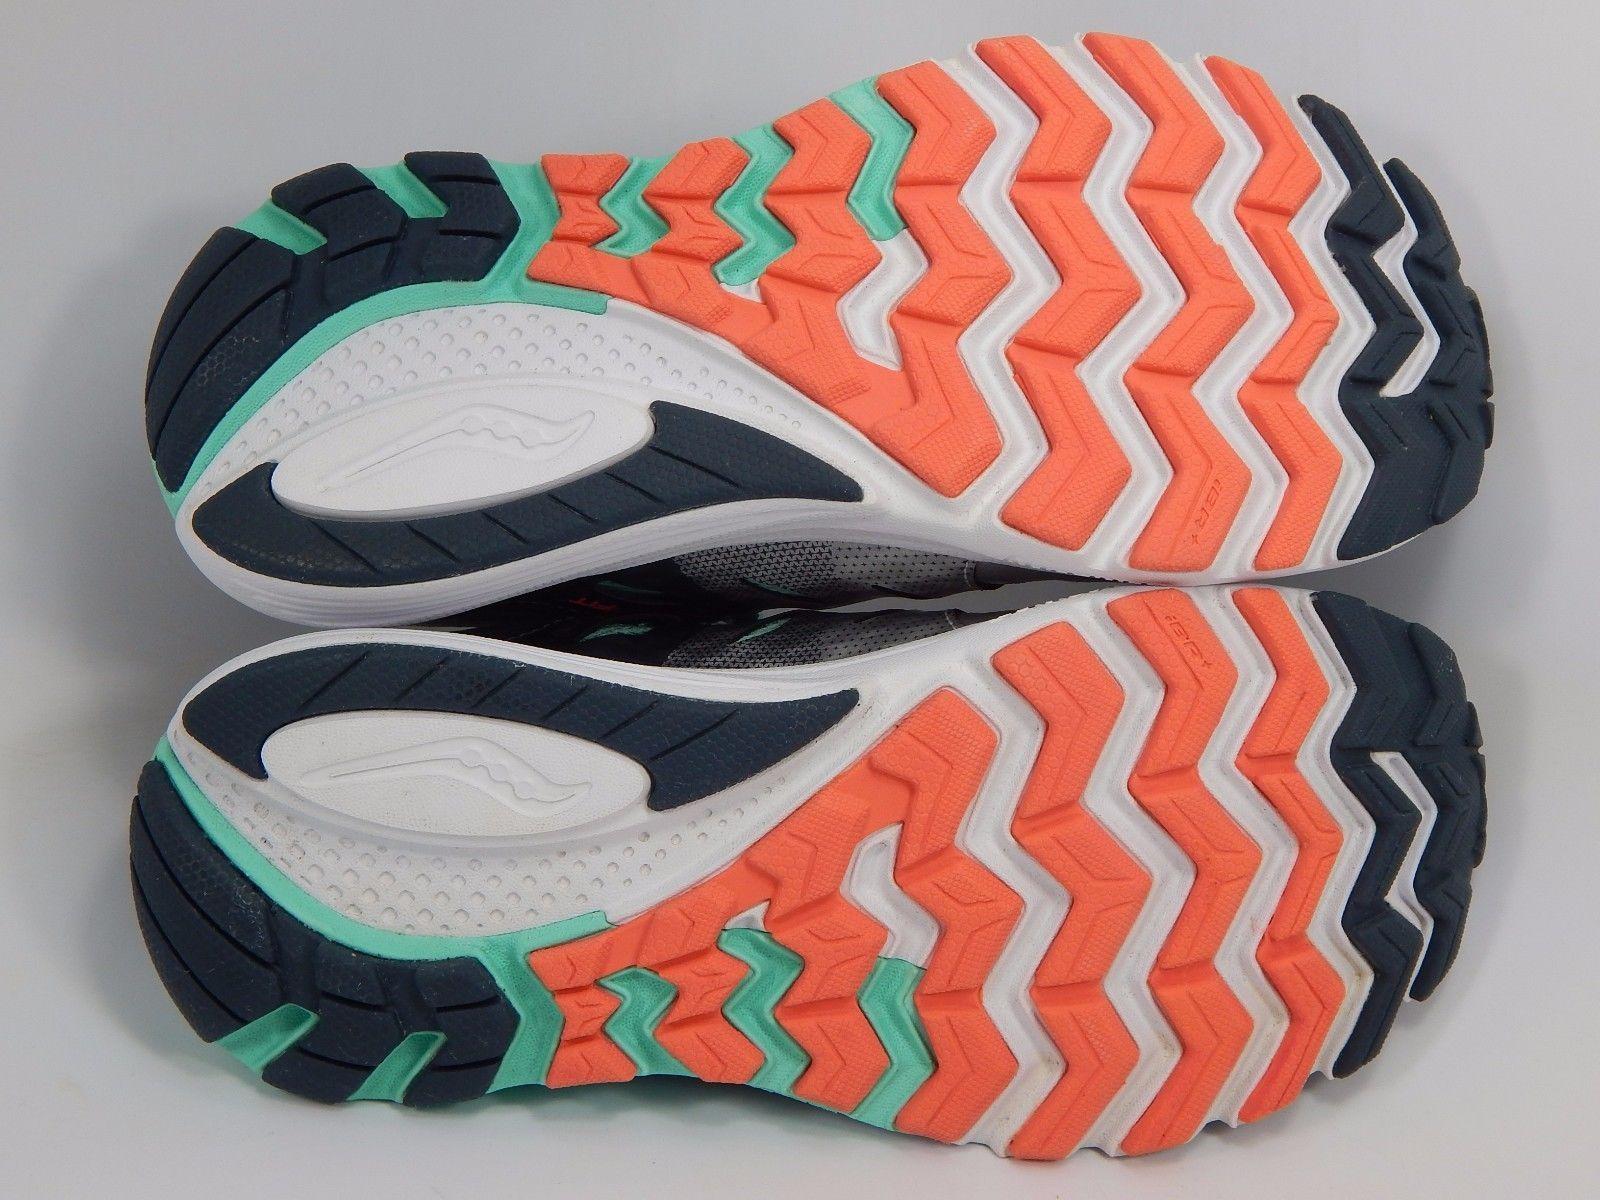 Saucony Zealot ISO 2 Women's Running Shoes Size US 8 M (B) EU 39 Silver S10314-1